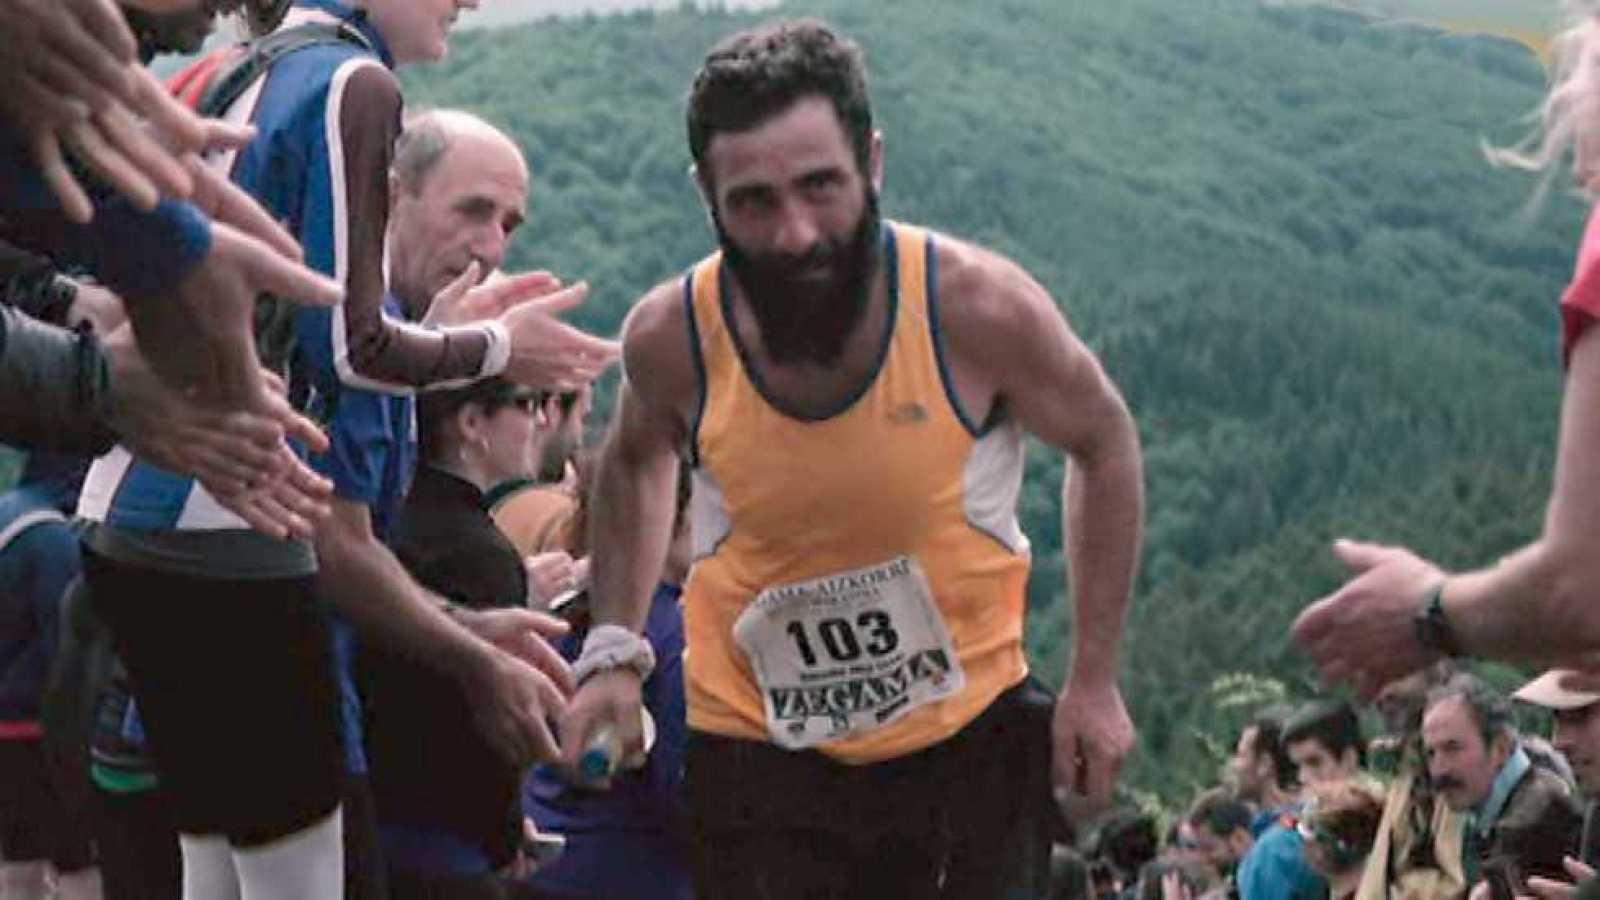 Maratón de montaña - Zegama 2017 - ver ahora